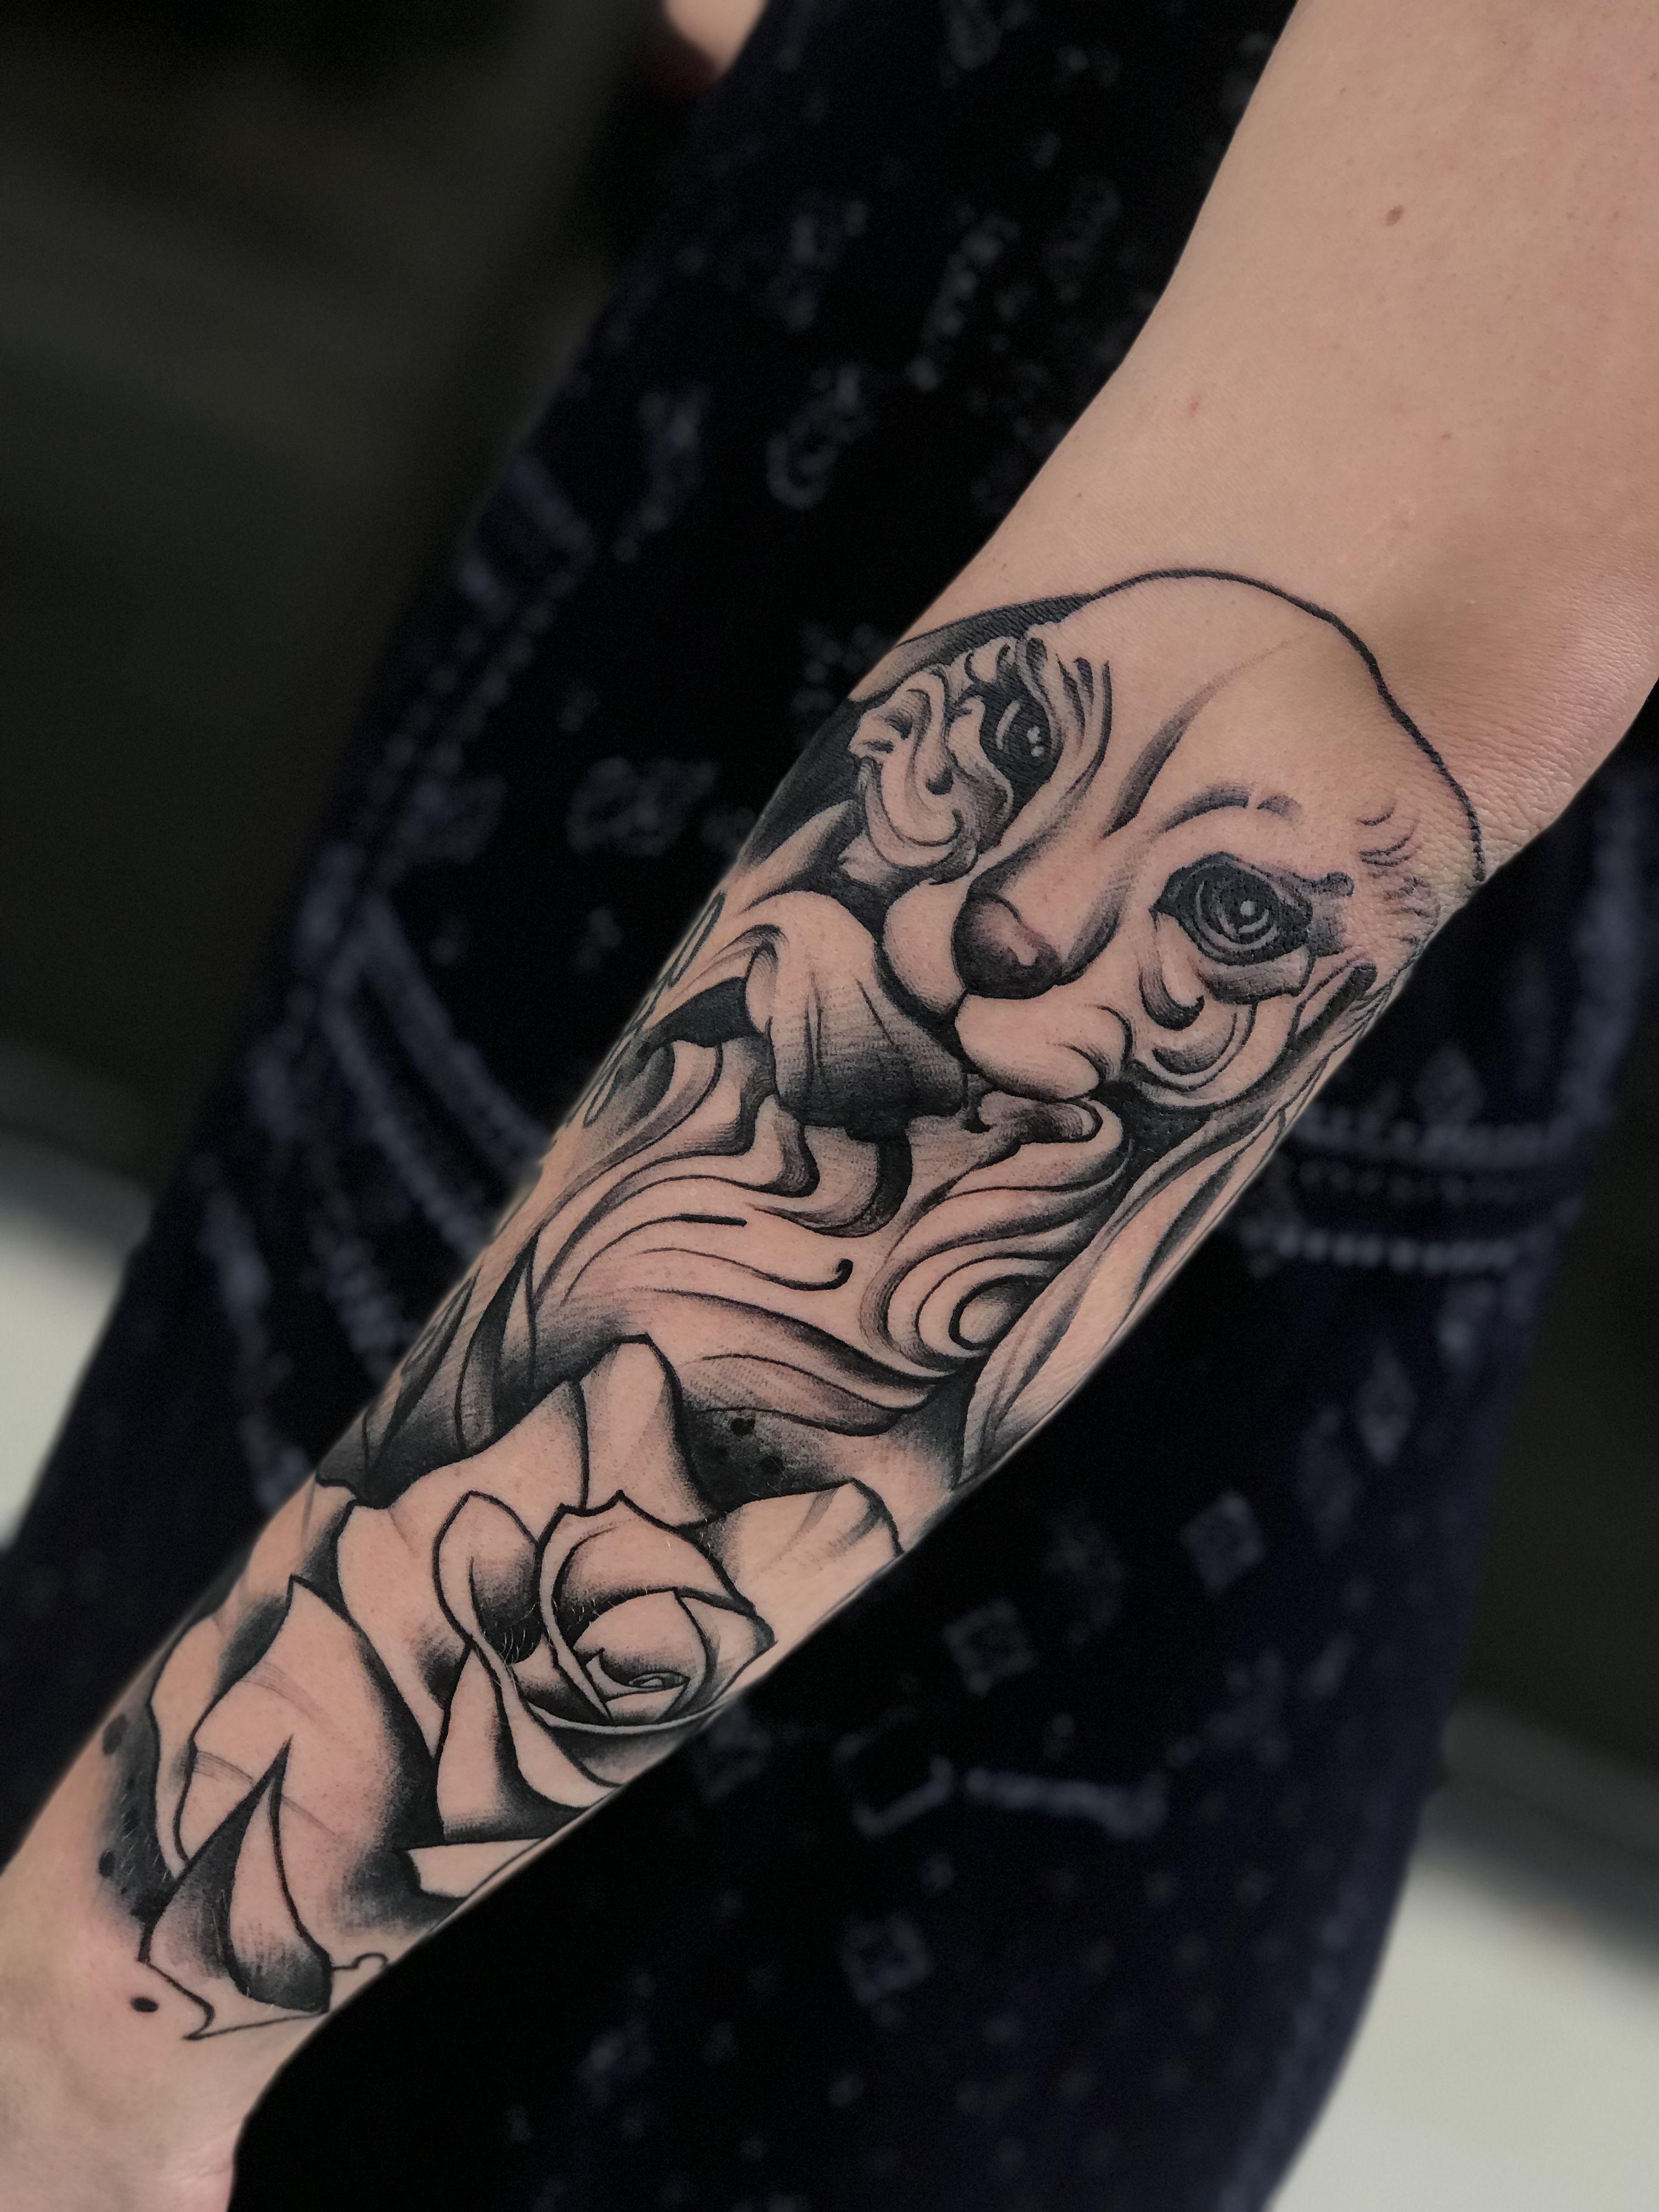 Tattoo Art Tato Pria Tato Lengan Gambar Tato